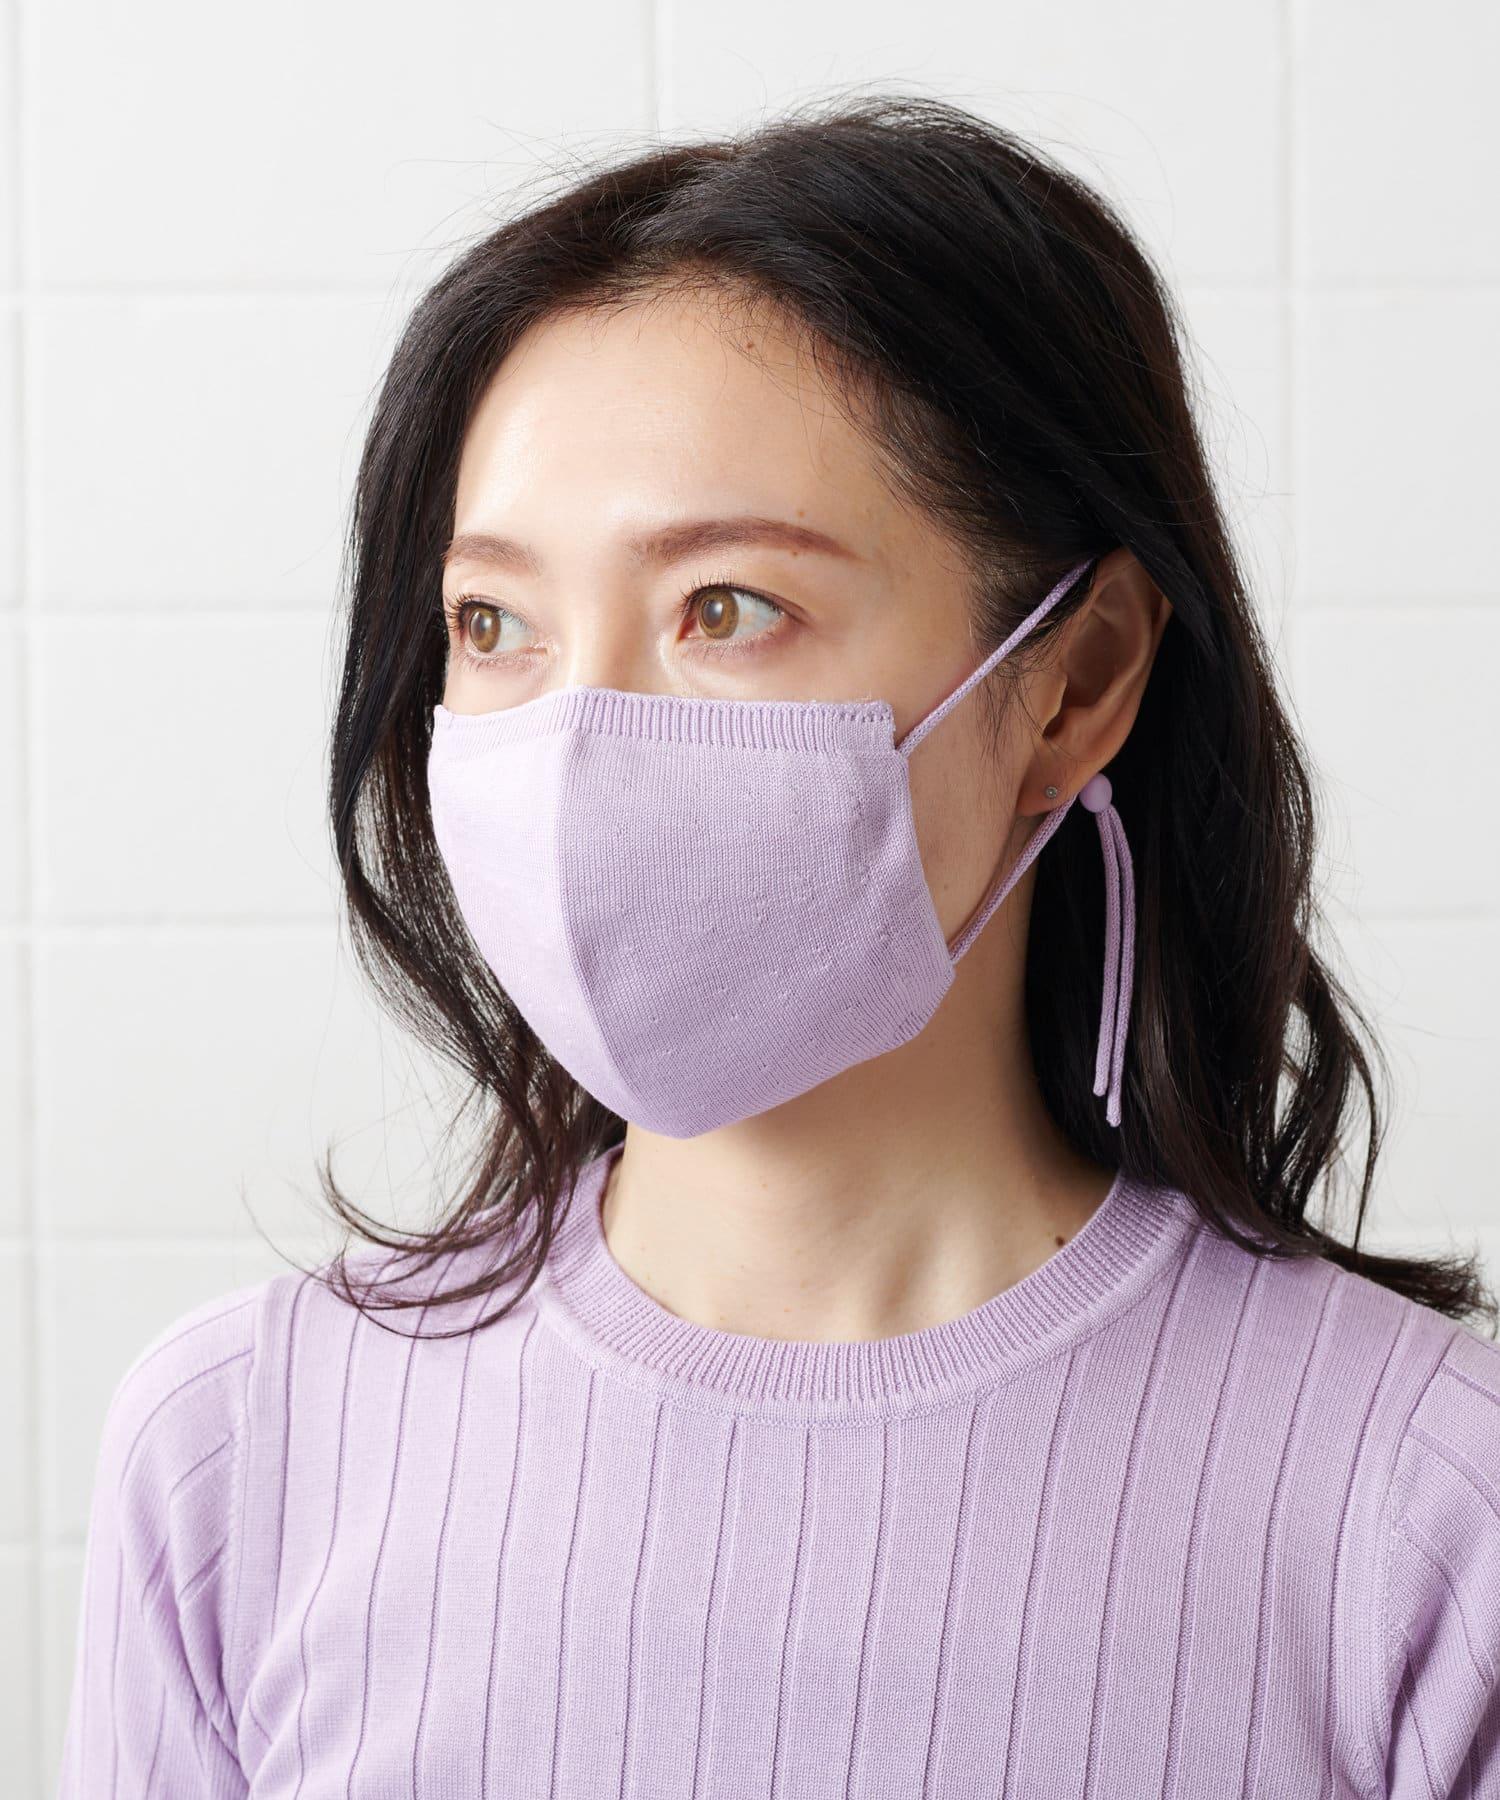 PLUS OTO.HA(プラス オトハ) シルク100%ニットマスク